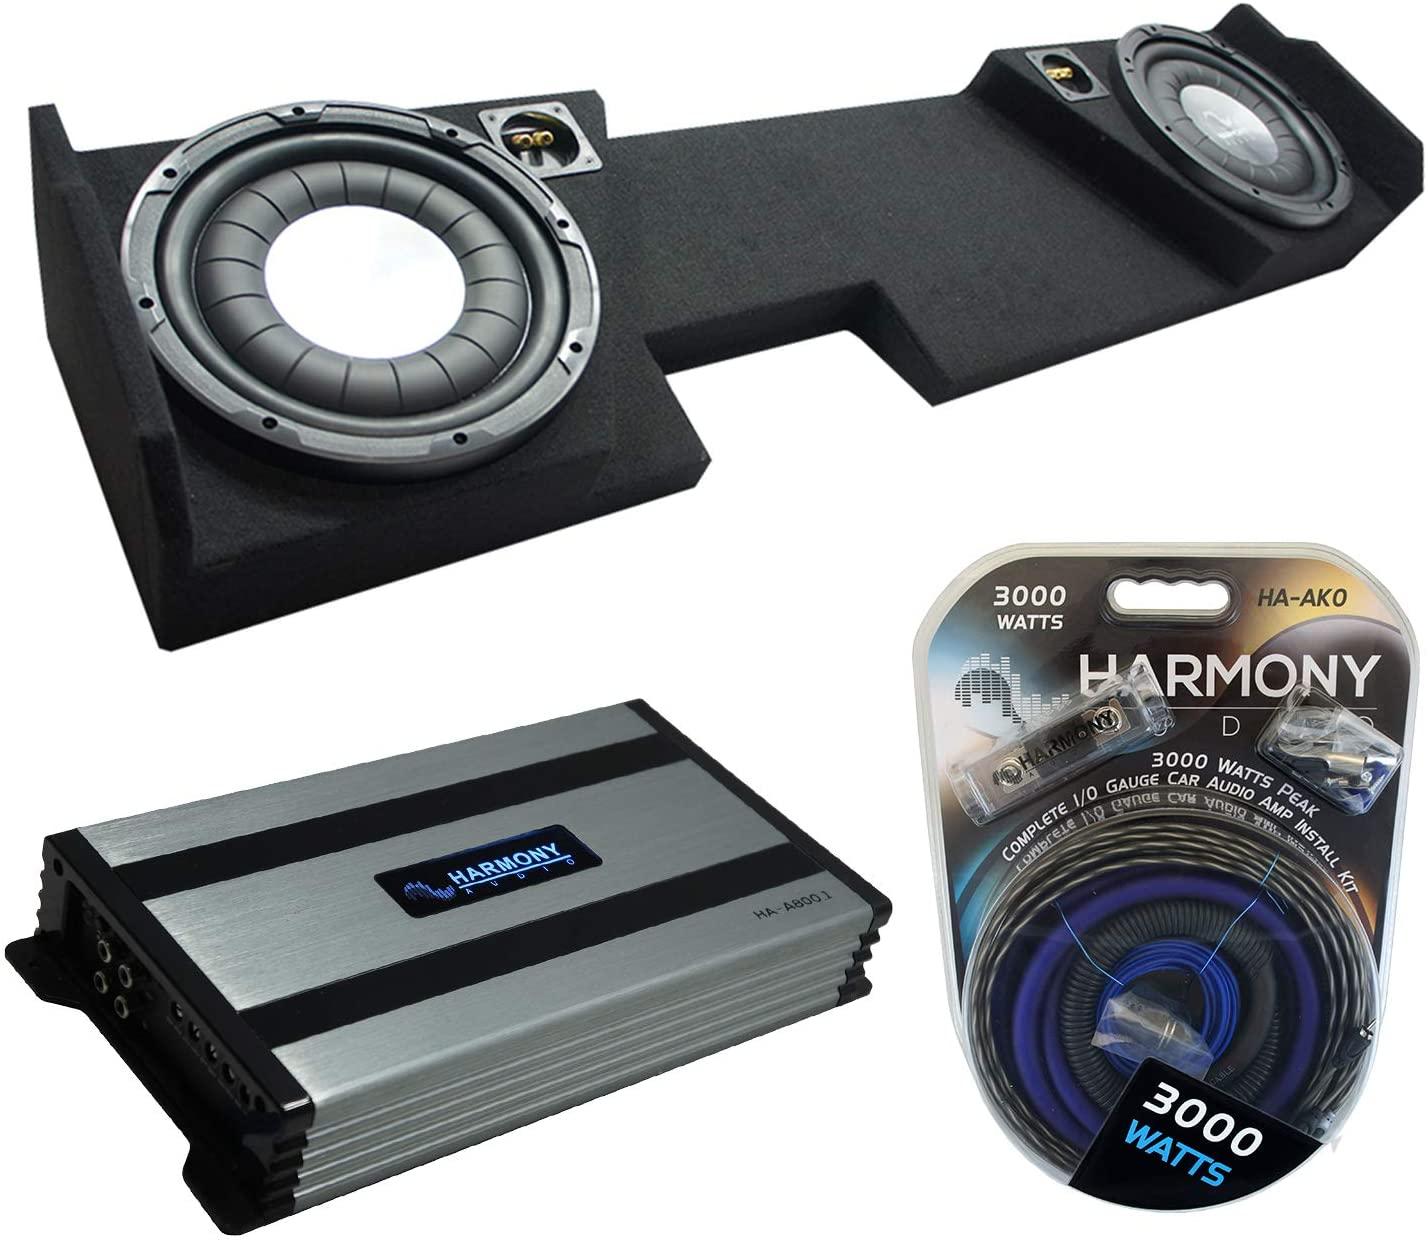 Compatible with 2014 - UP Chevy Silverado Double Cab Harmony Audio Bundle HA-F104 Dual 10 Sub Box HA-A800.1 Amp